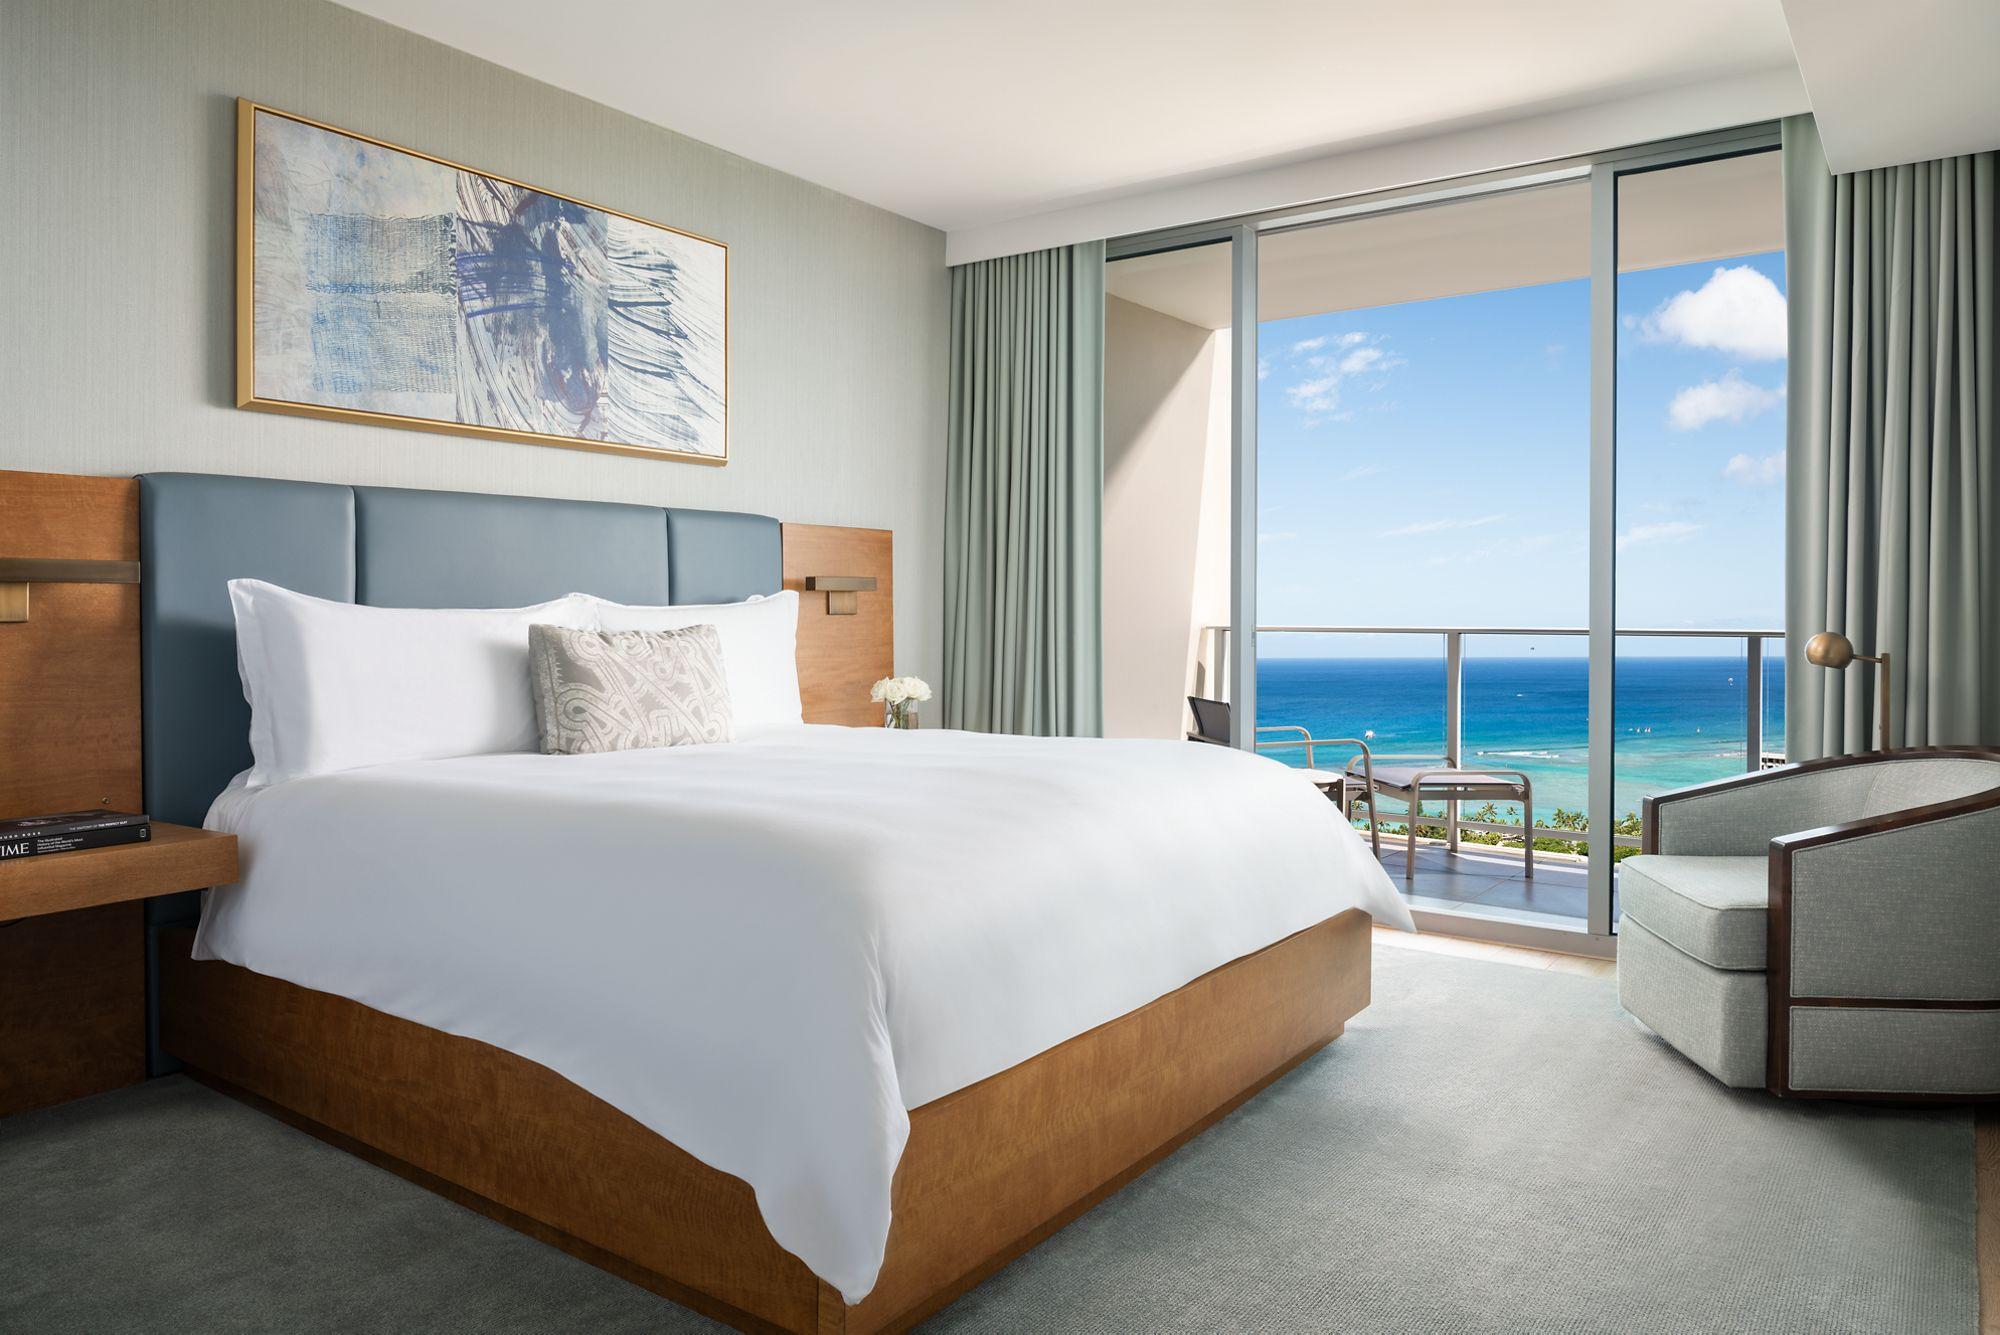 Premier ocean view, 12 bedroom suite The Ritz-Carlton, Waikiki Beach